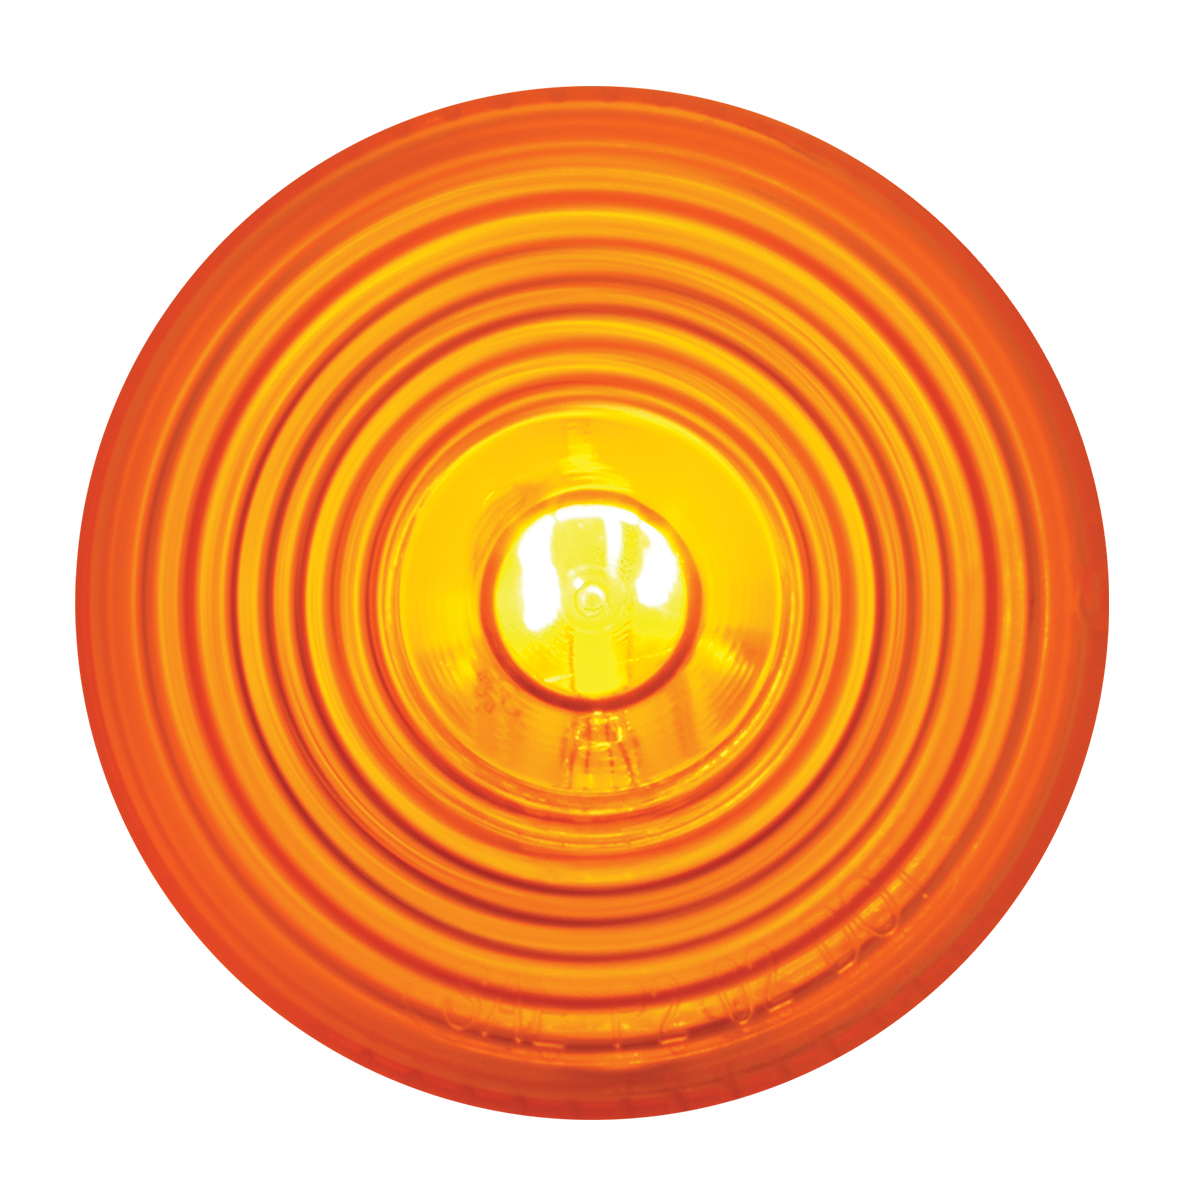 "#80723 2"" Round Incandescent Flat Amber/Amber Light"